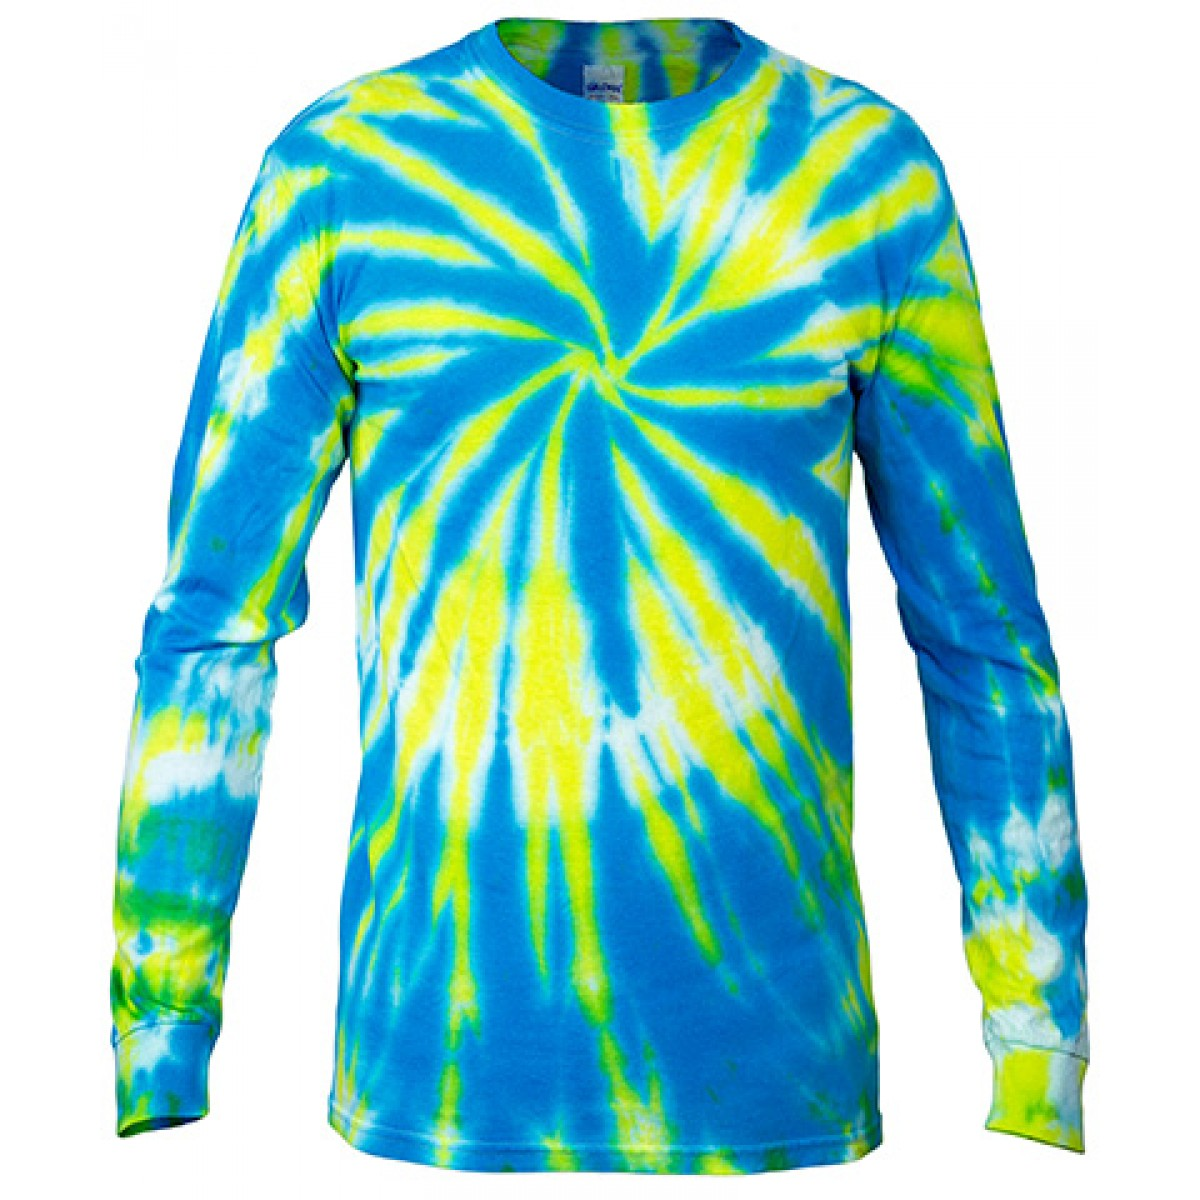 Multi Color Tie-Dye Long Sleeve Shirt -Blue-2XL